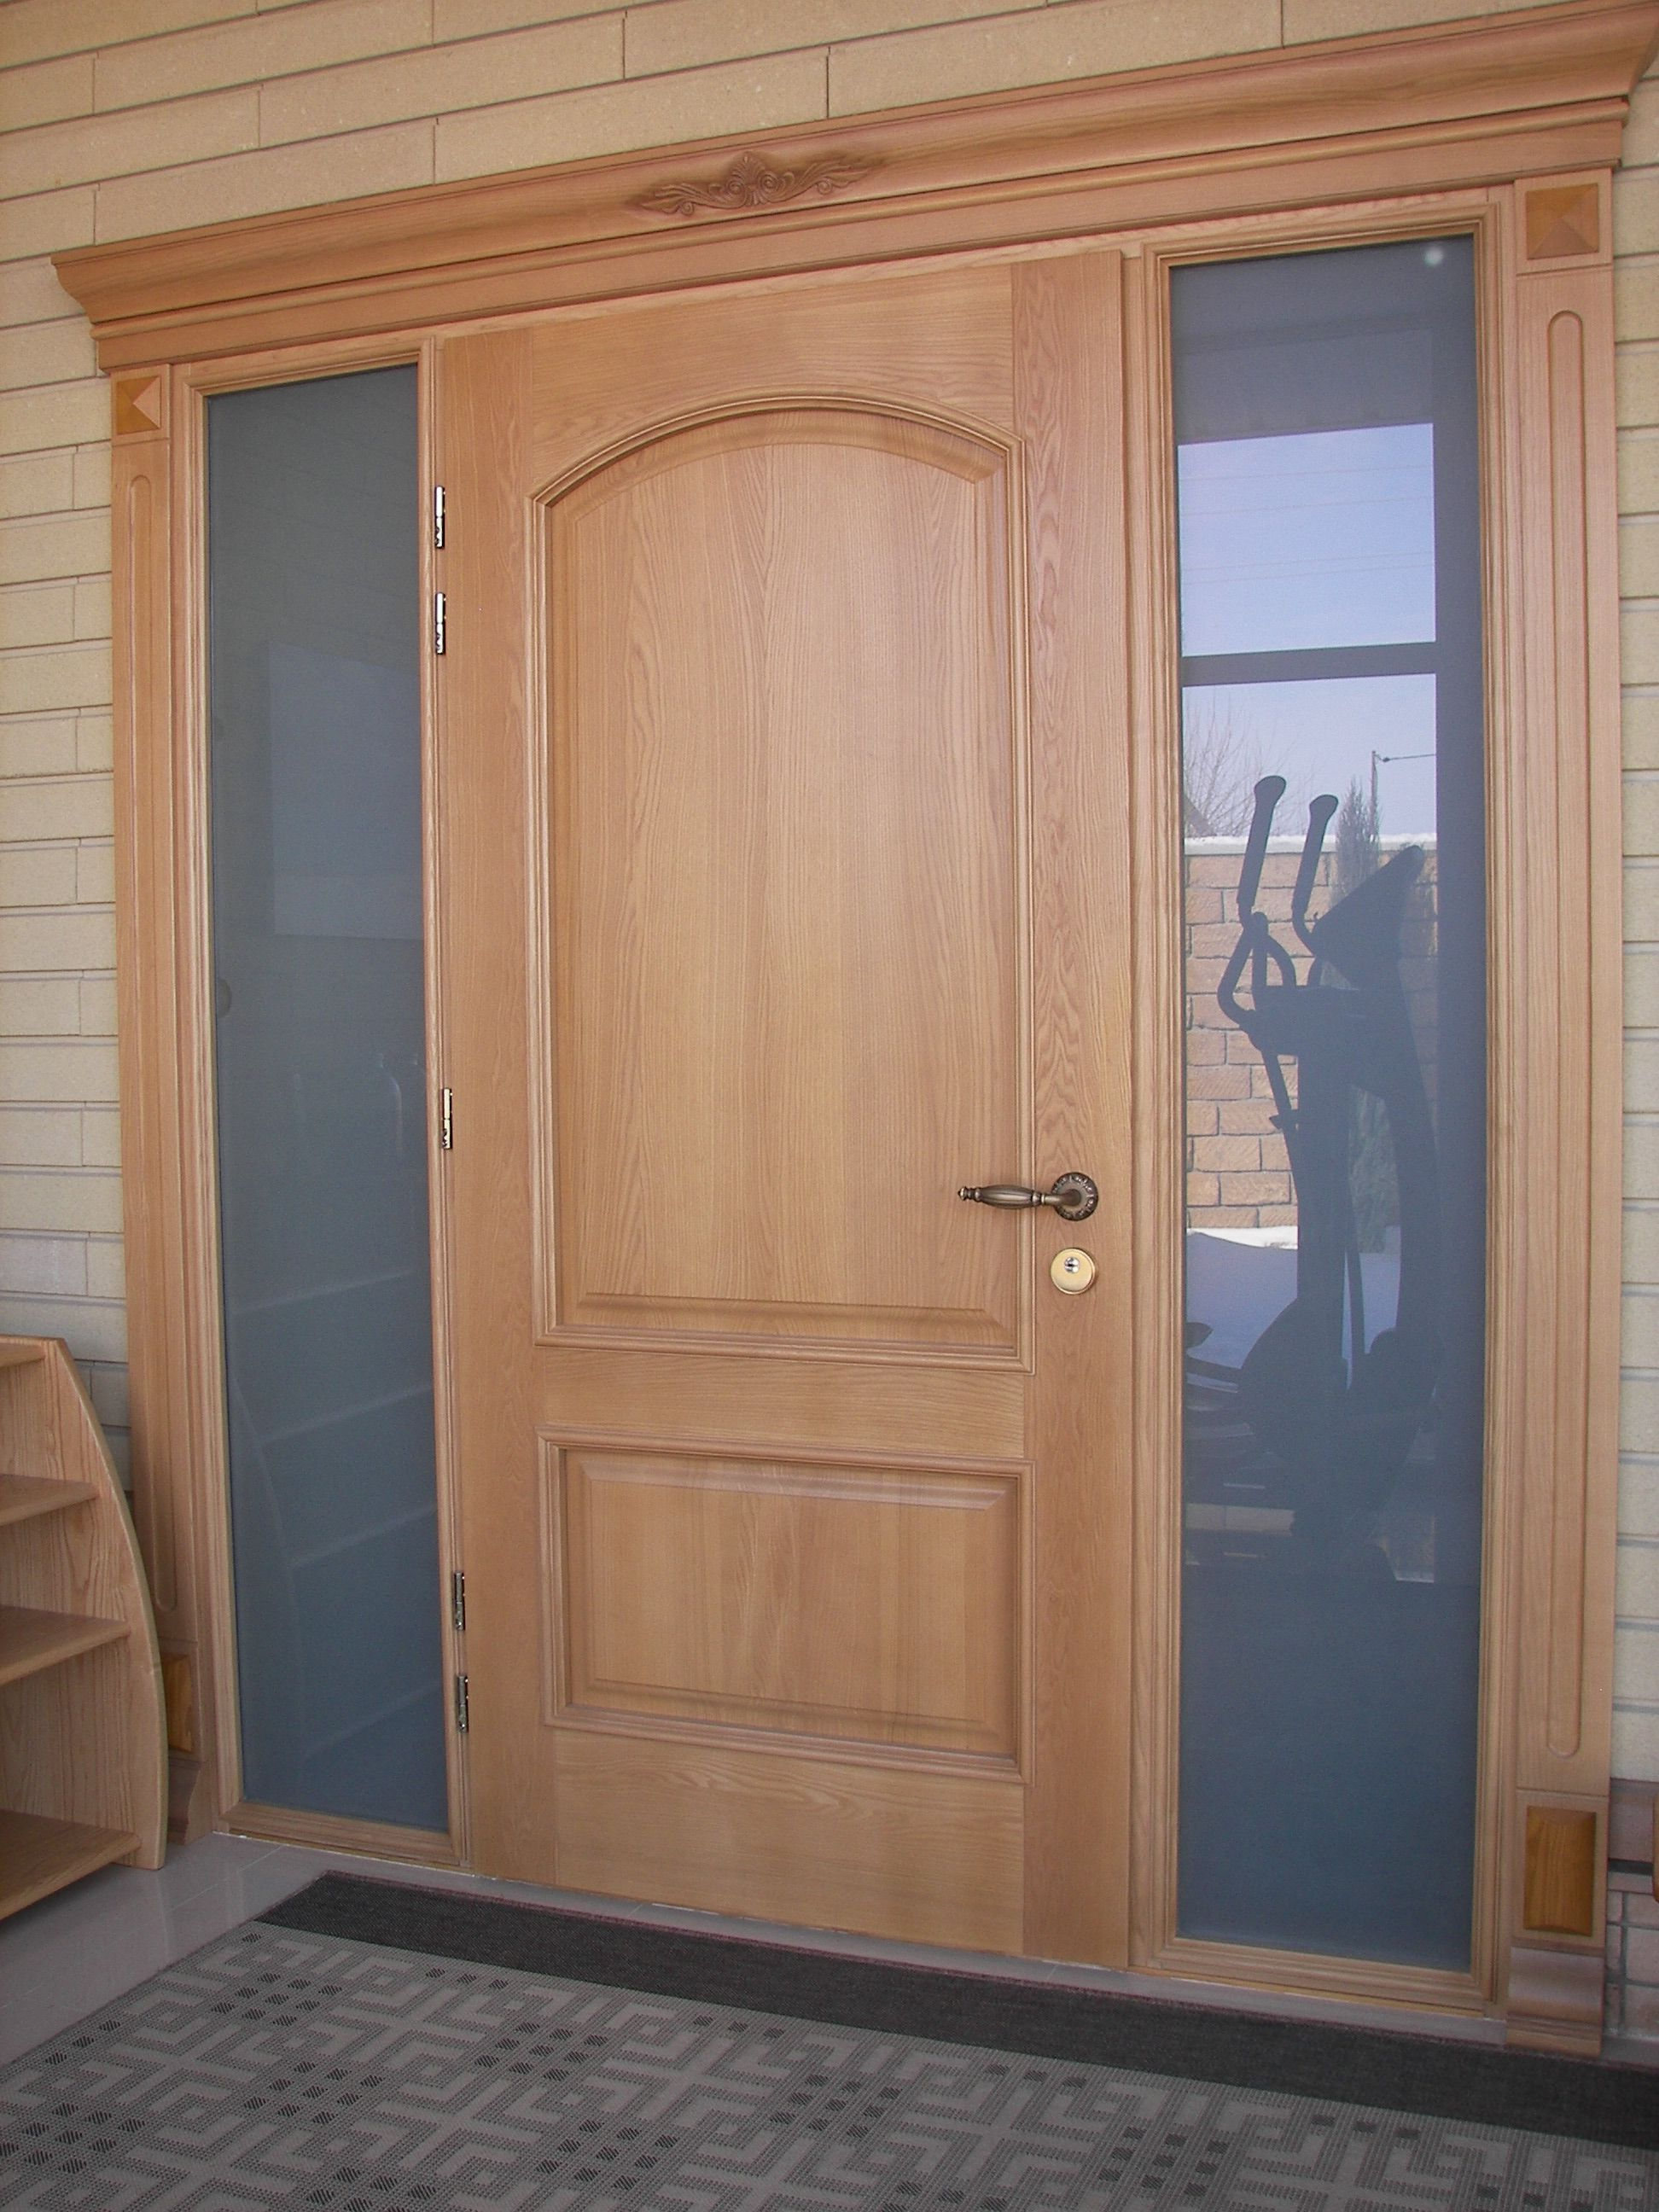 Entrance door made of wood